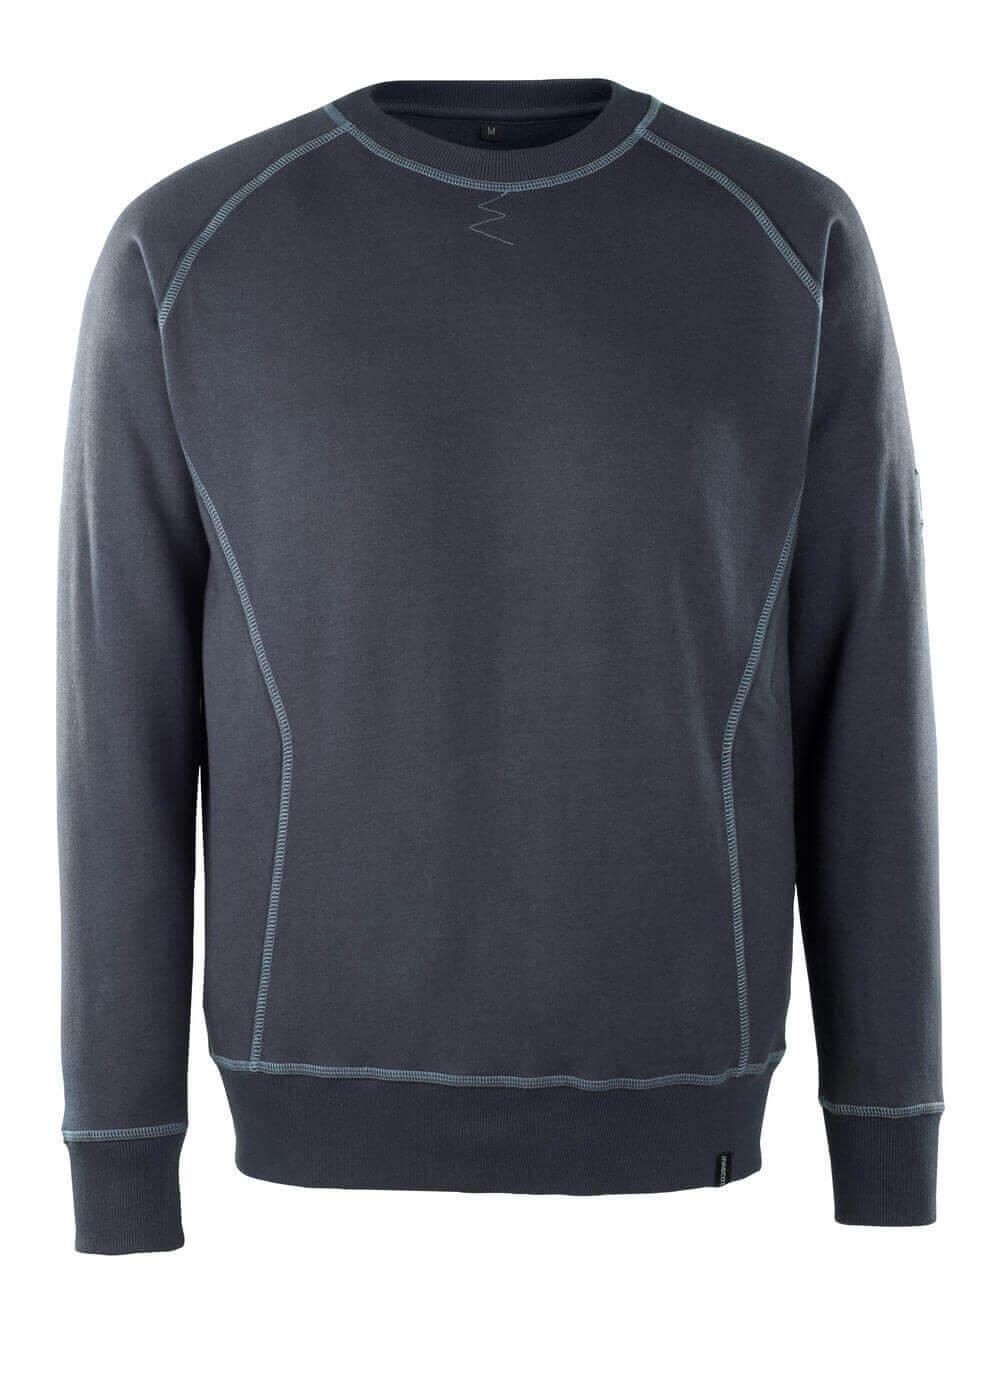 50120-928-010 Sweatshirt - Marine foncé